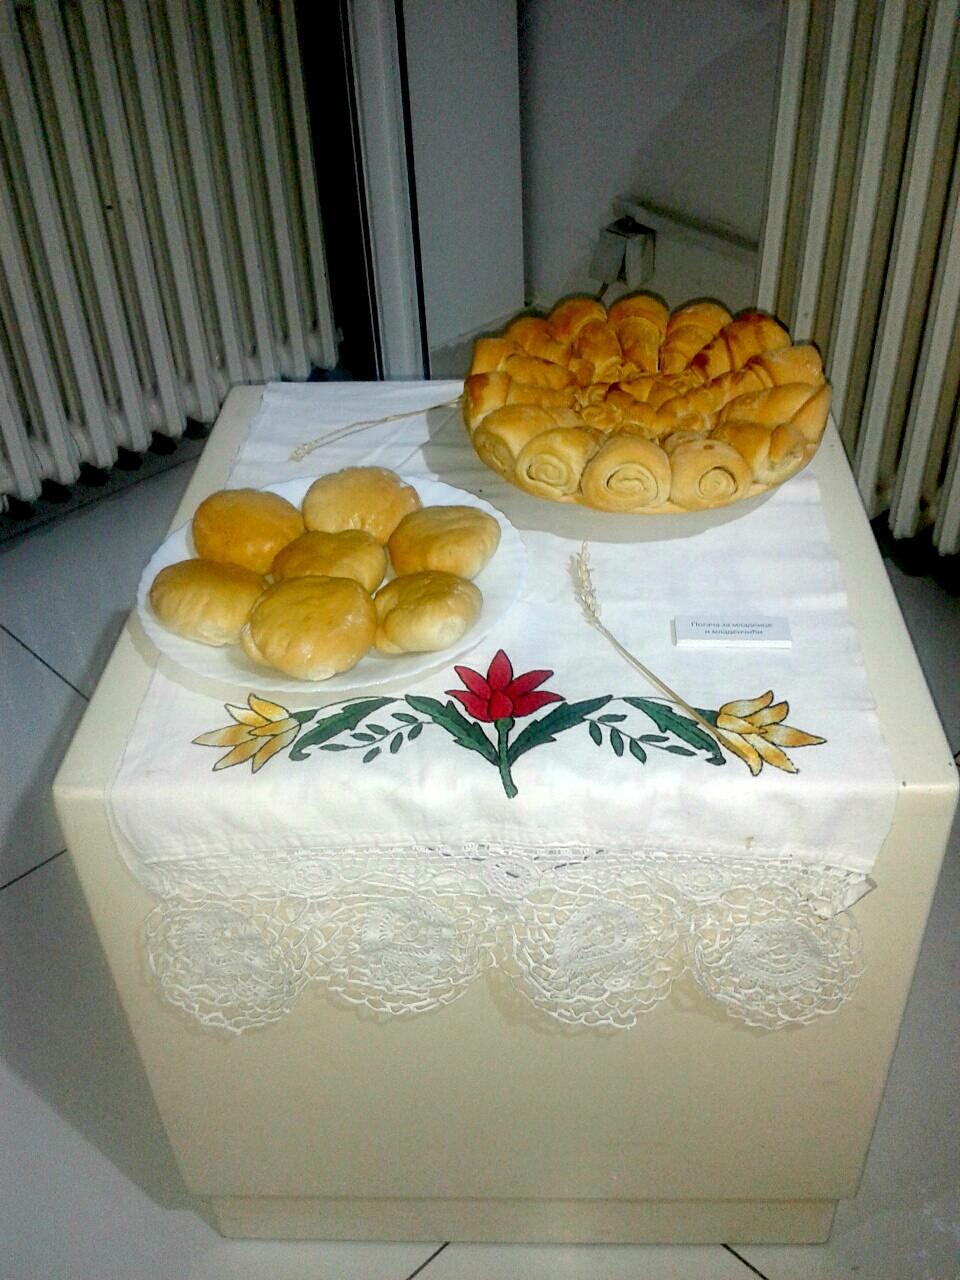 Obredni hlebovi u porodičnim običajima